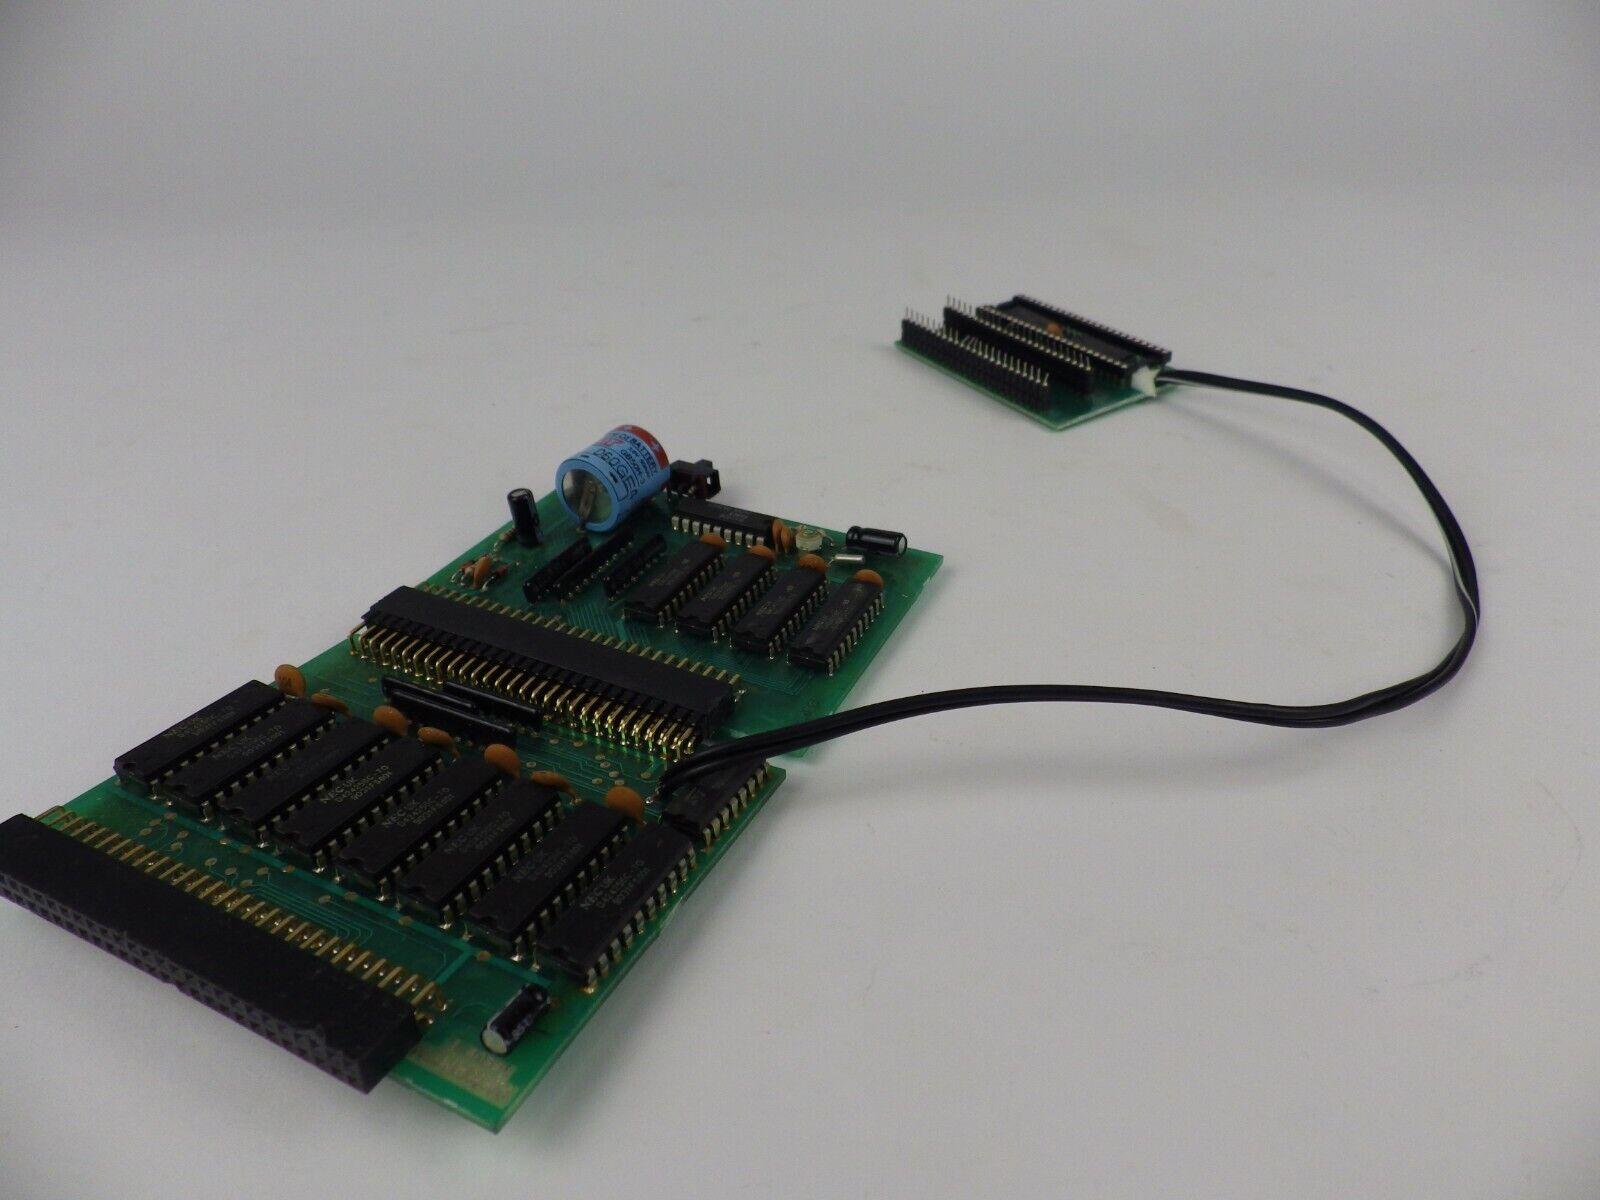  Commodore Amiga 500 1.5MB Expansion card - AMRAM-M